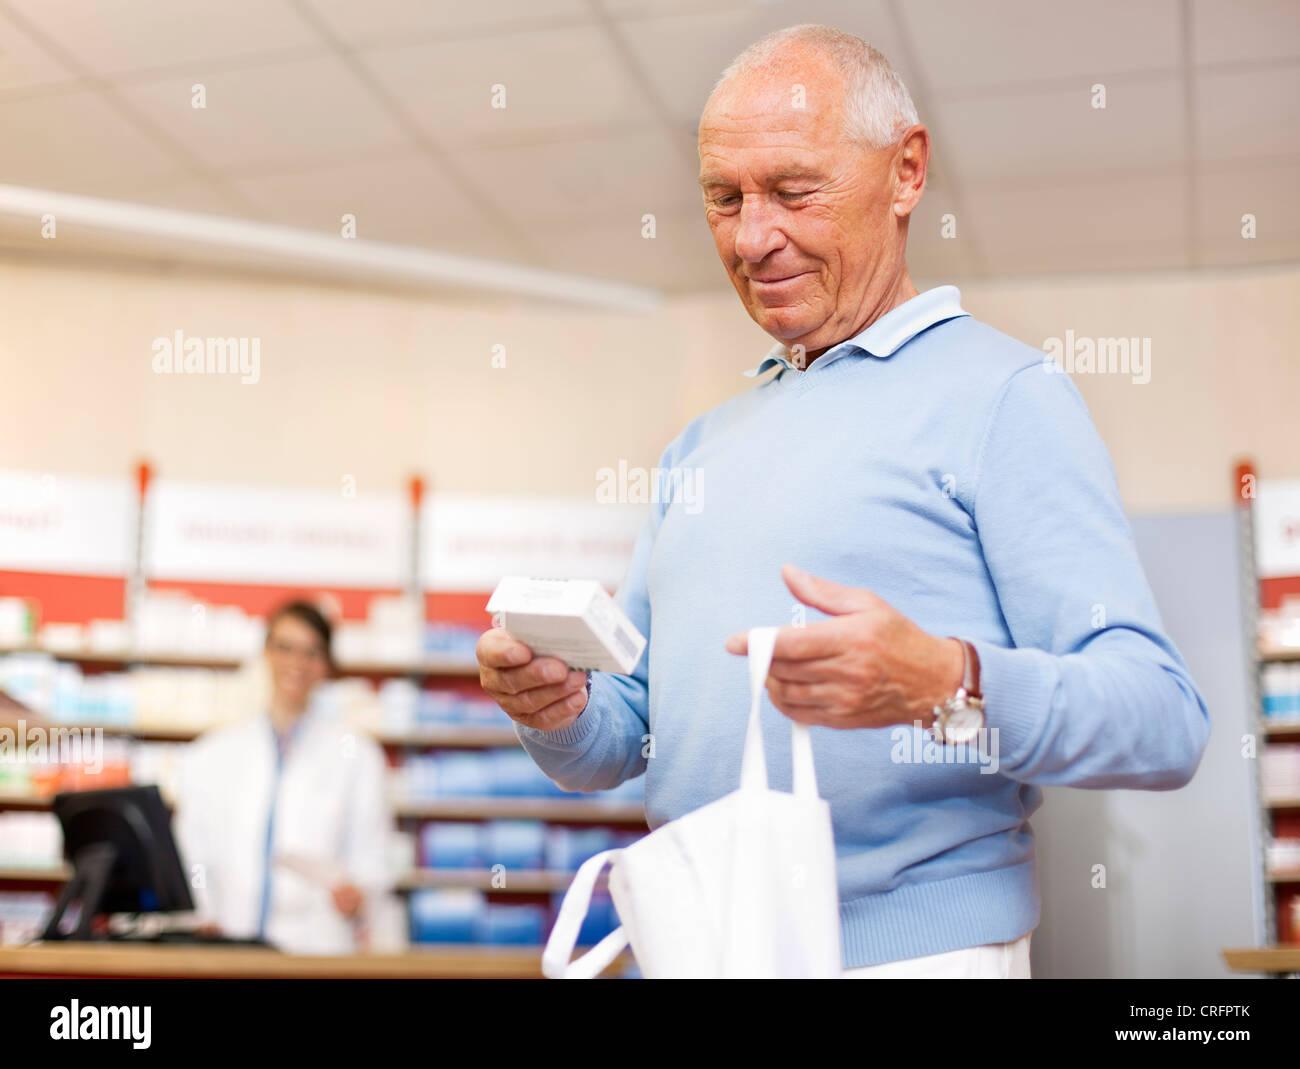 Man picking up prescription at pharmacy Stock Photo